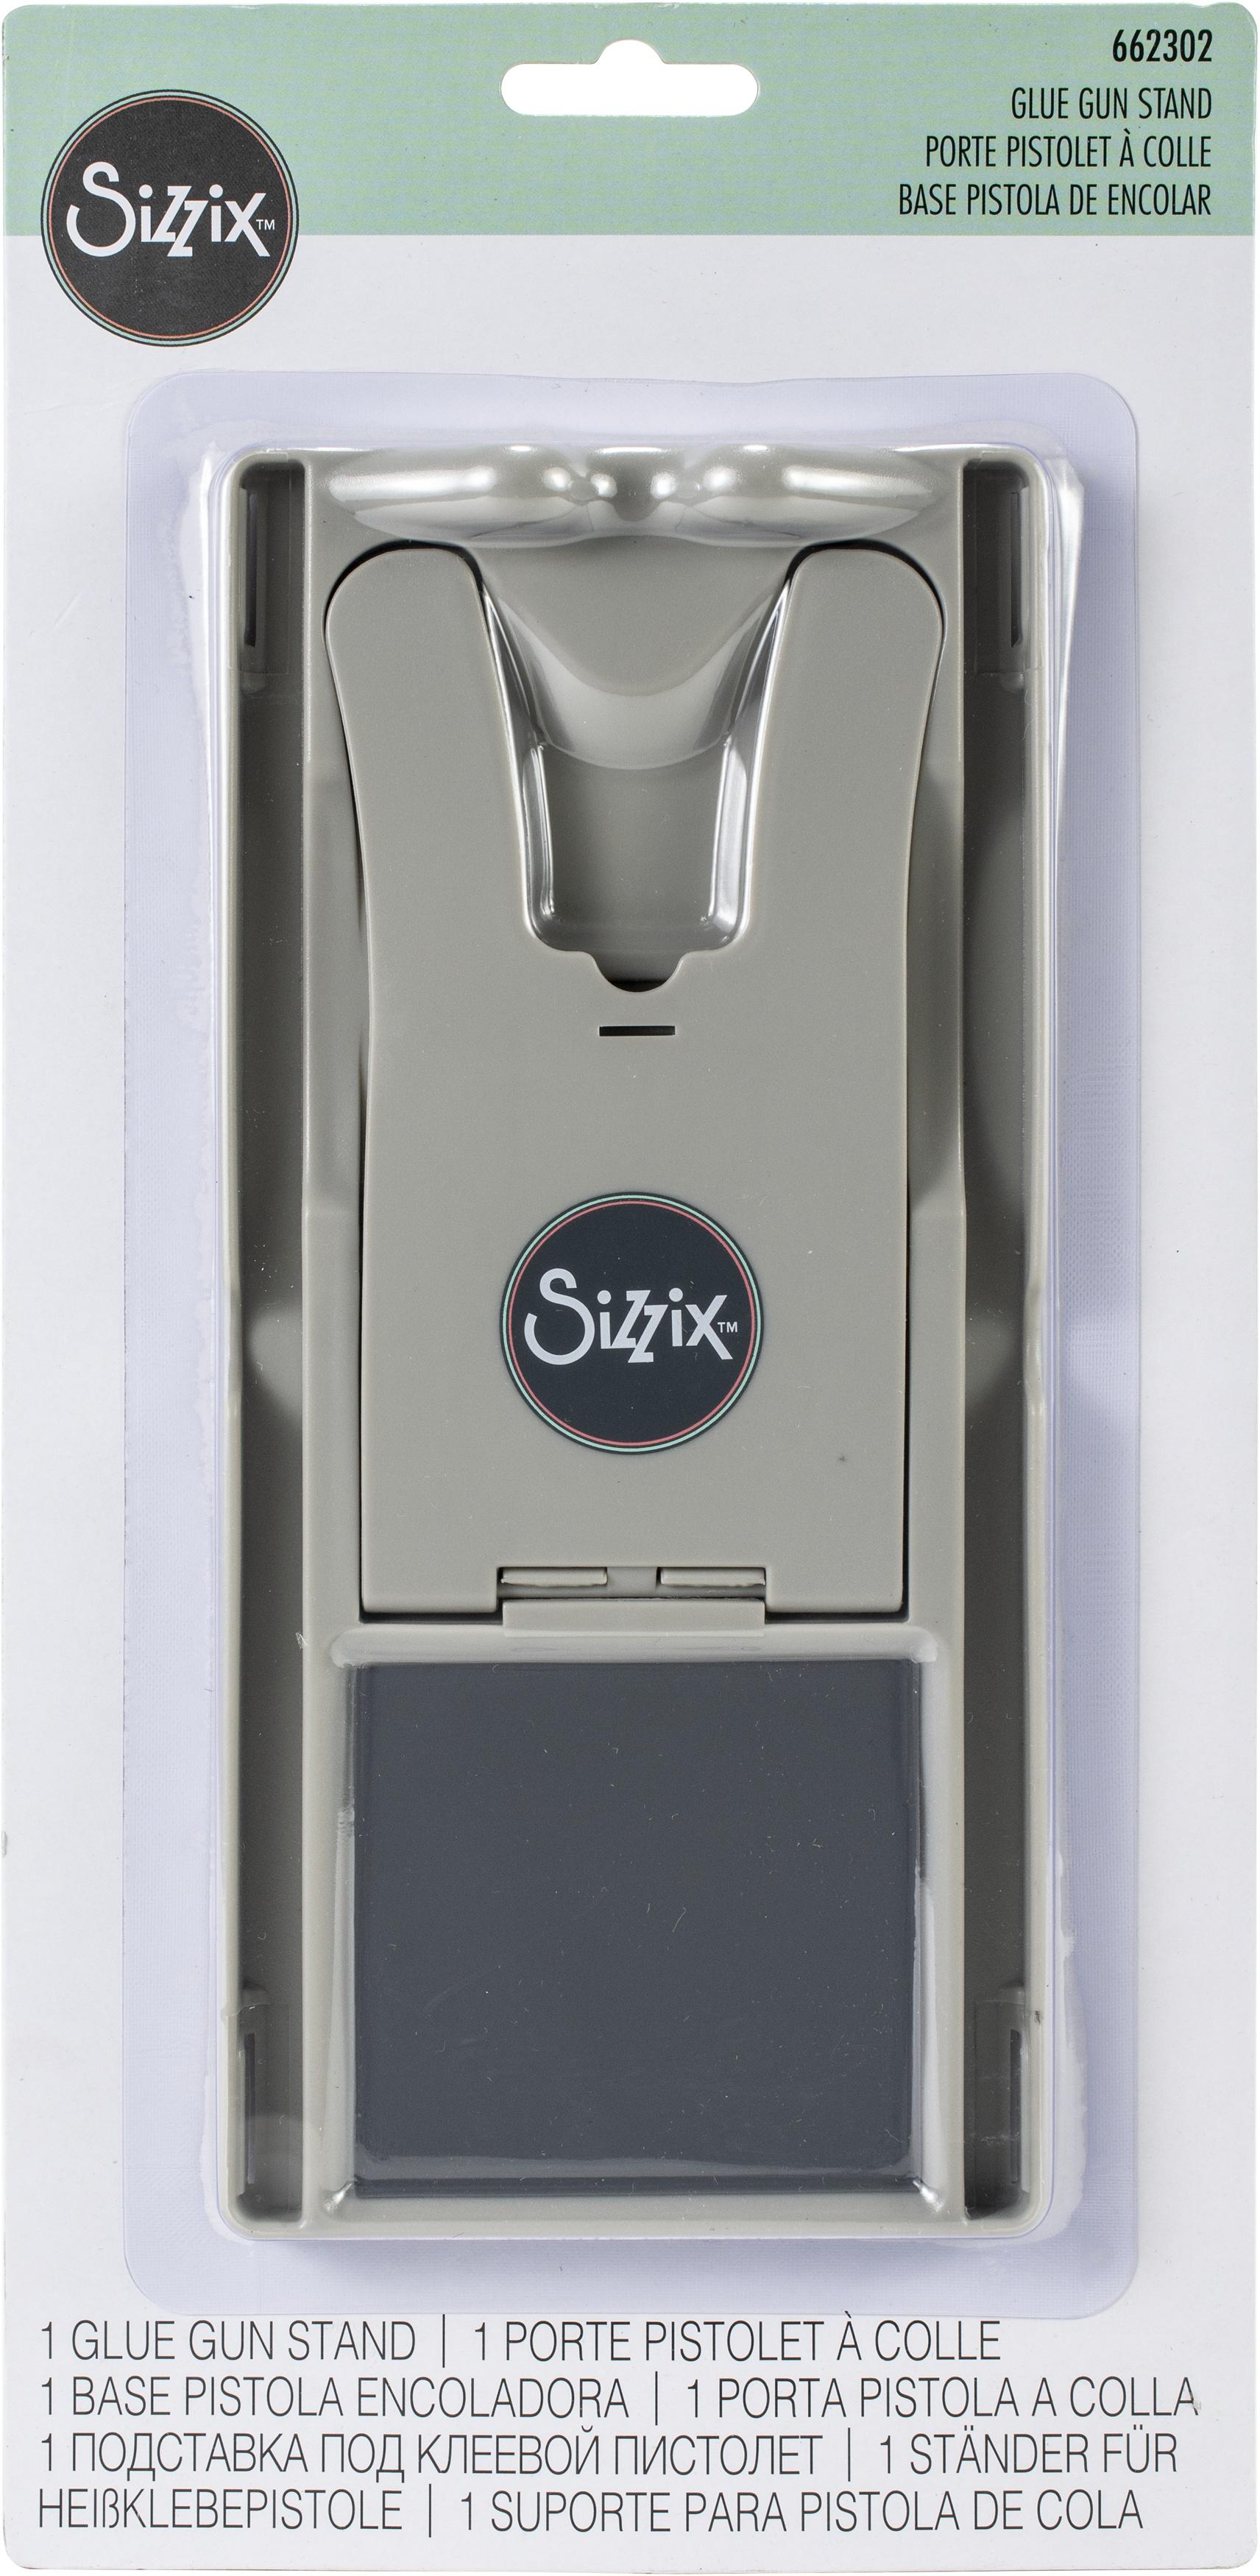 Sizzix Glue Gun Stand-